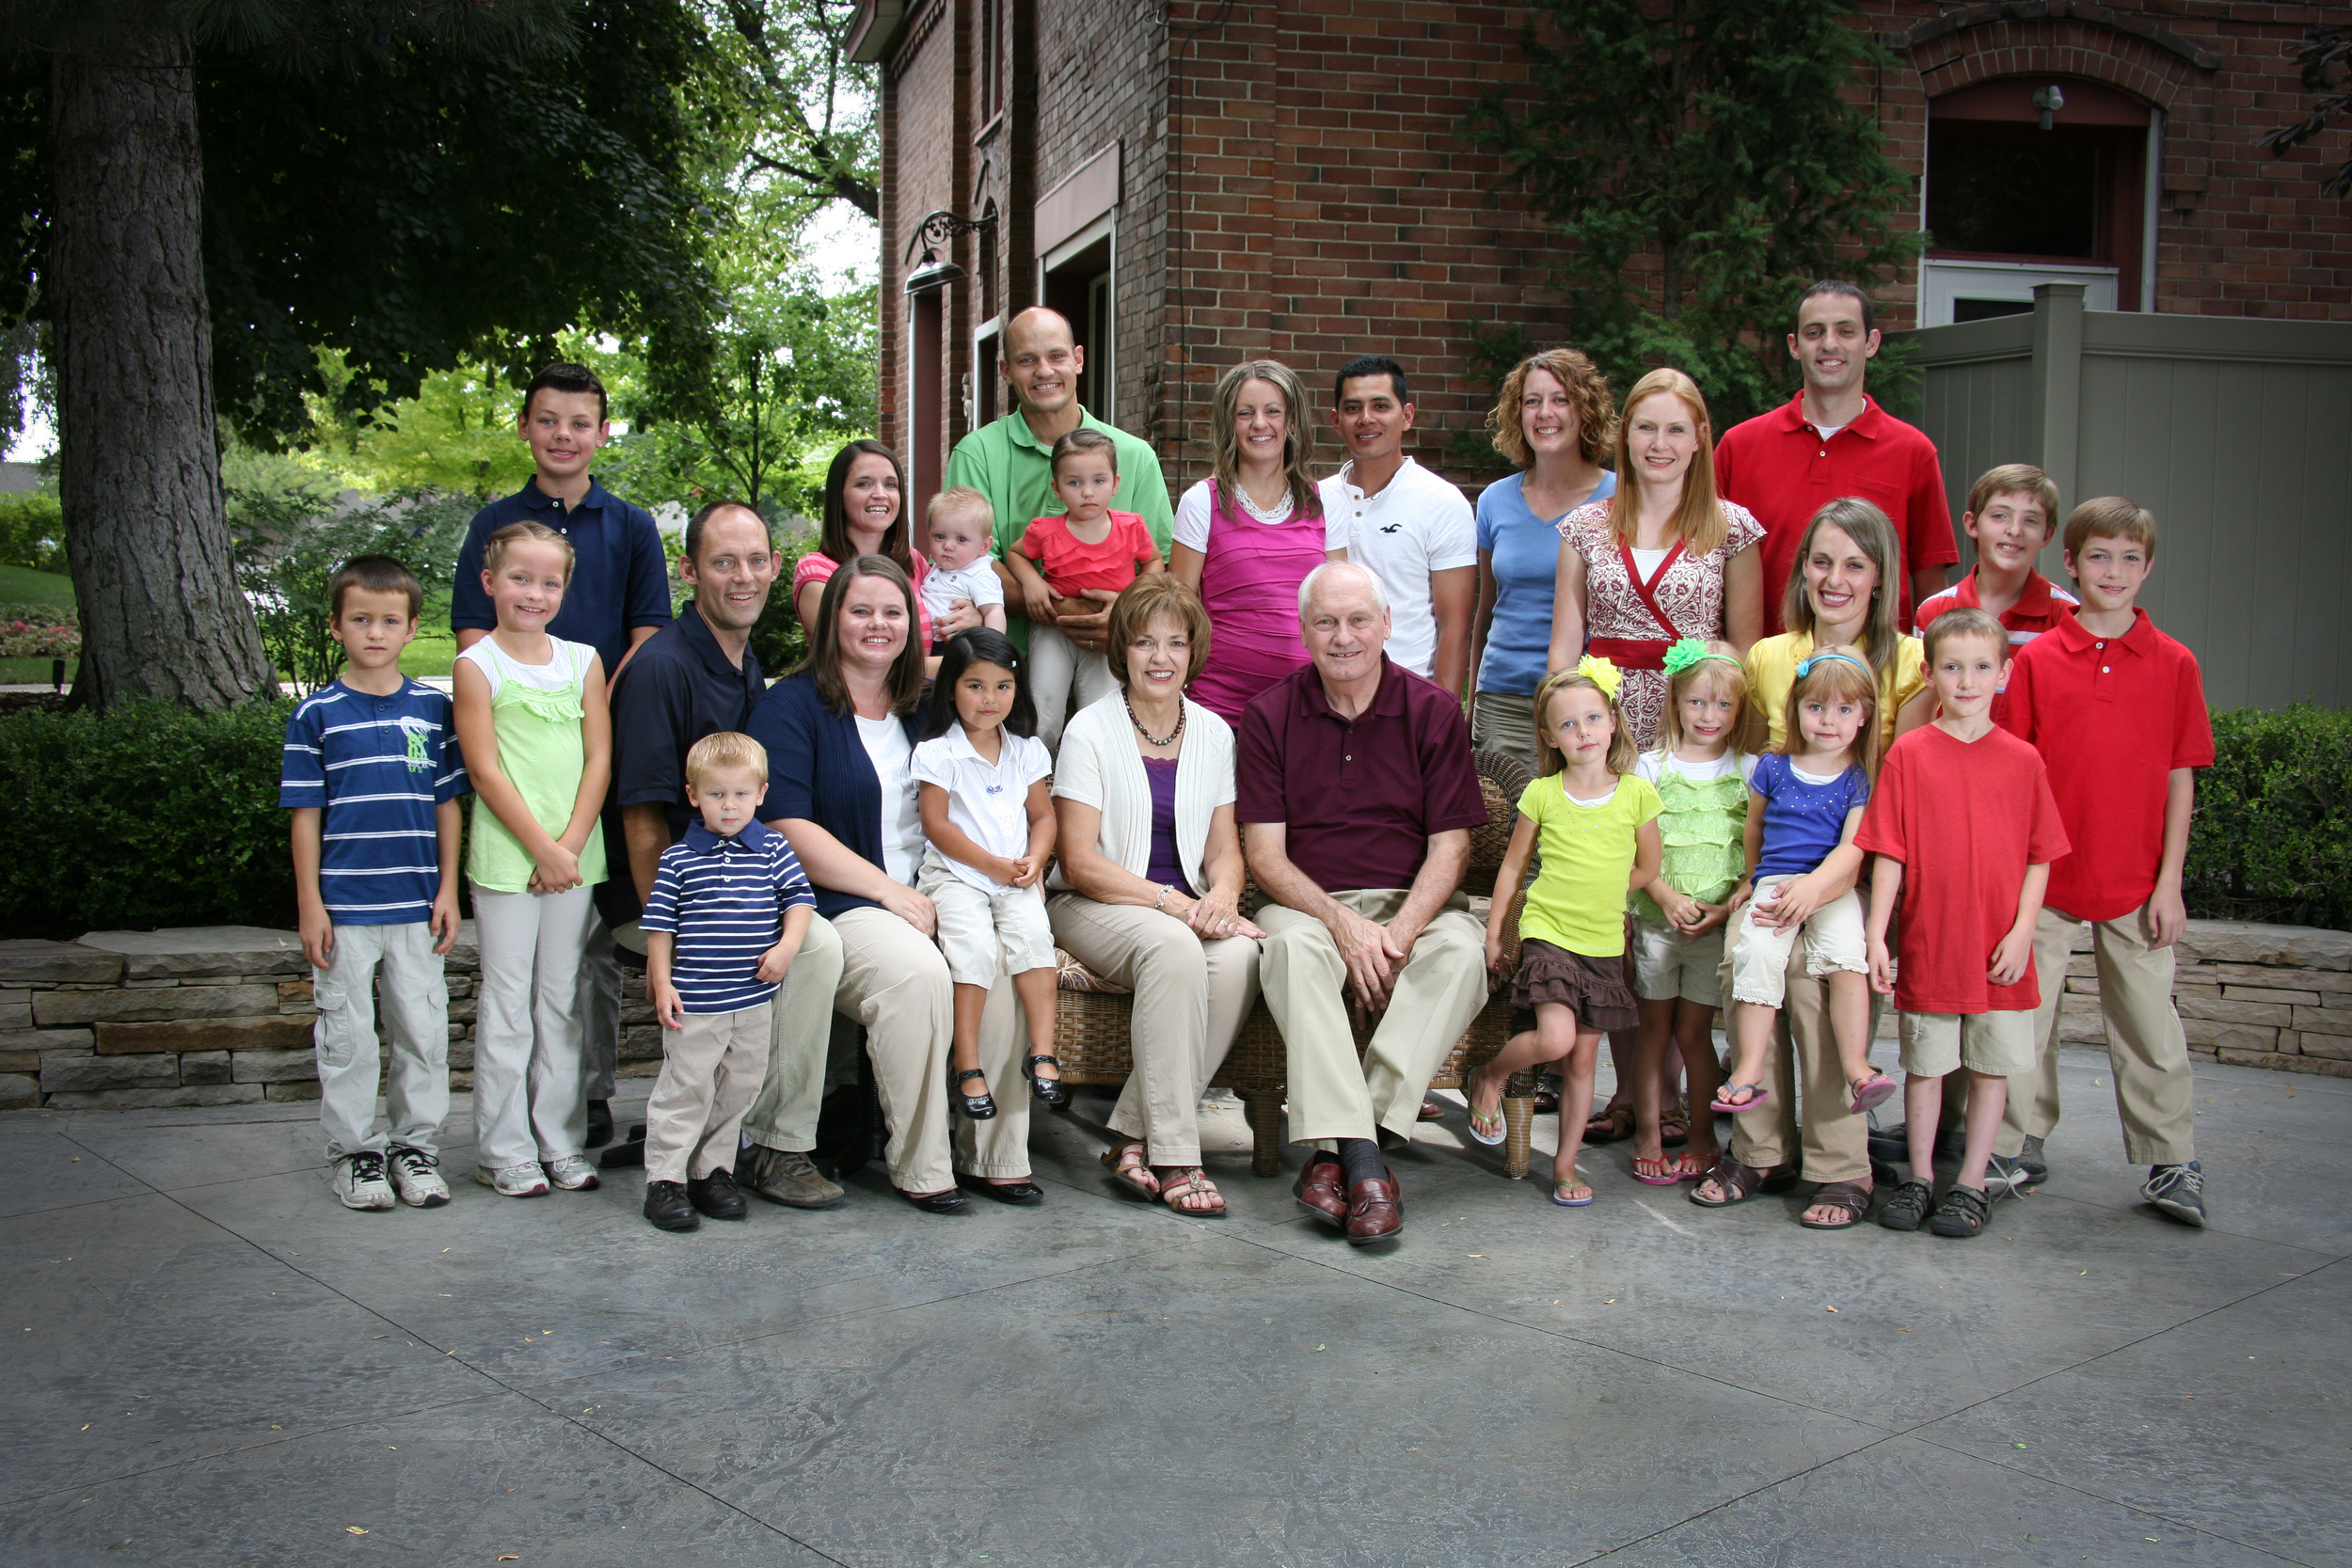 Bountiful Portrait studio, Outdoor studio Large Family Portrait